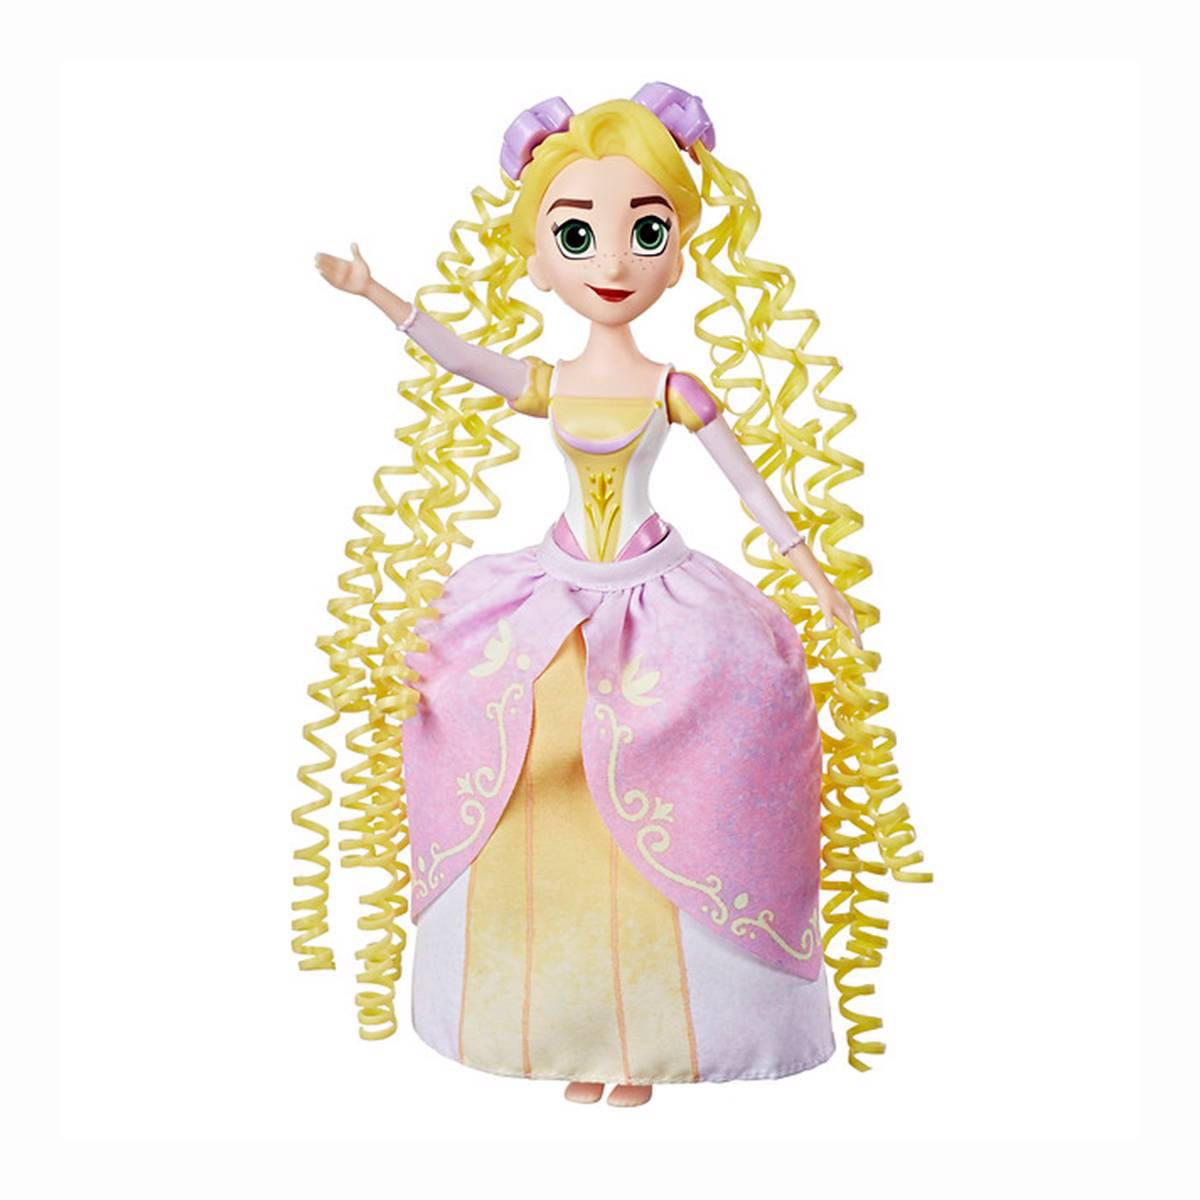 Disney Princess Rapunzel stijl collectie | wehkamp